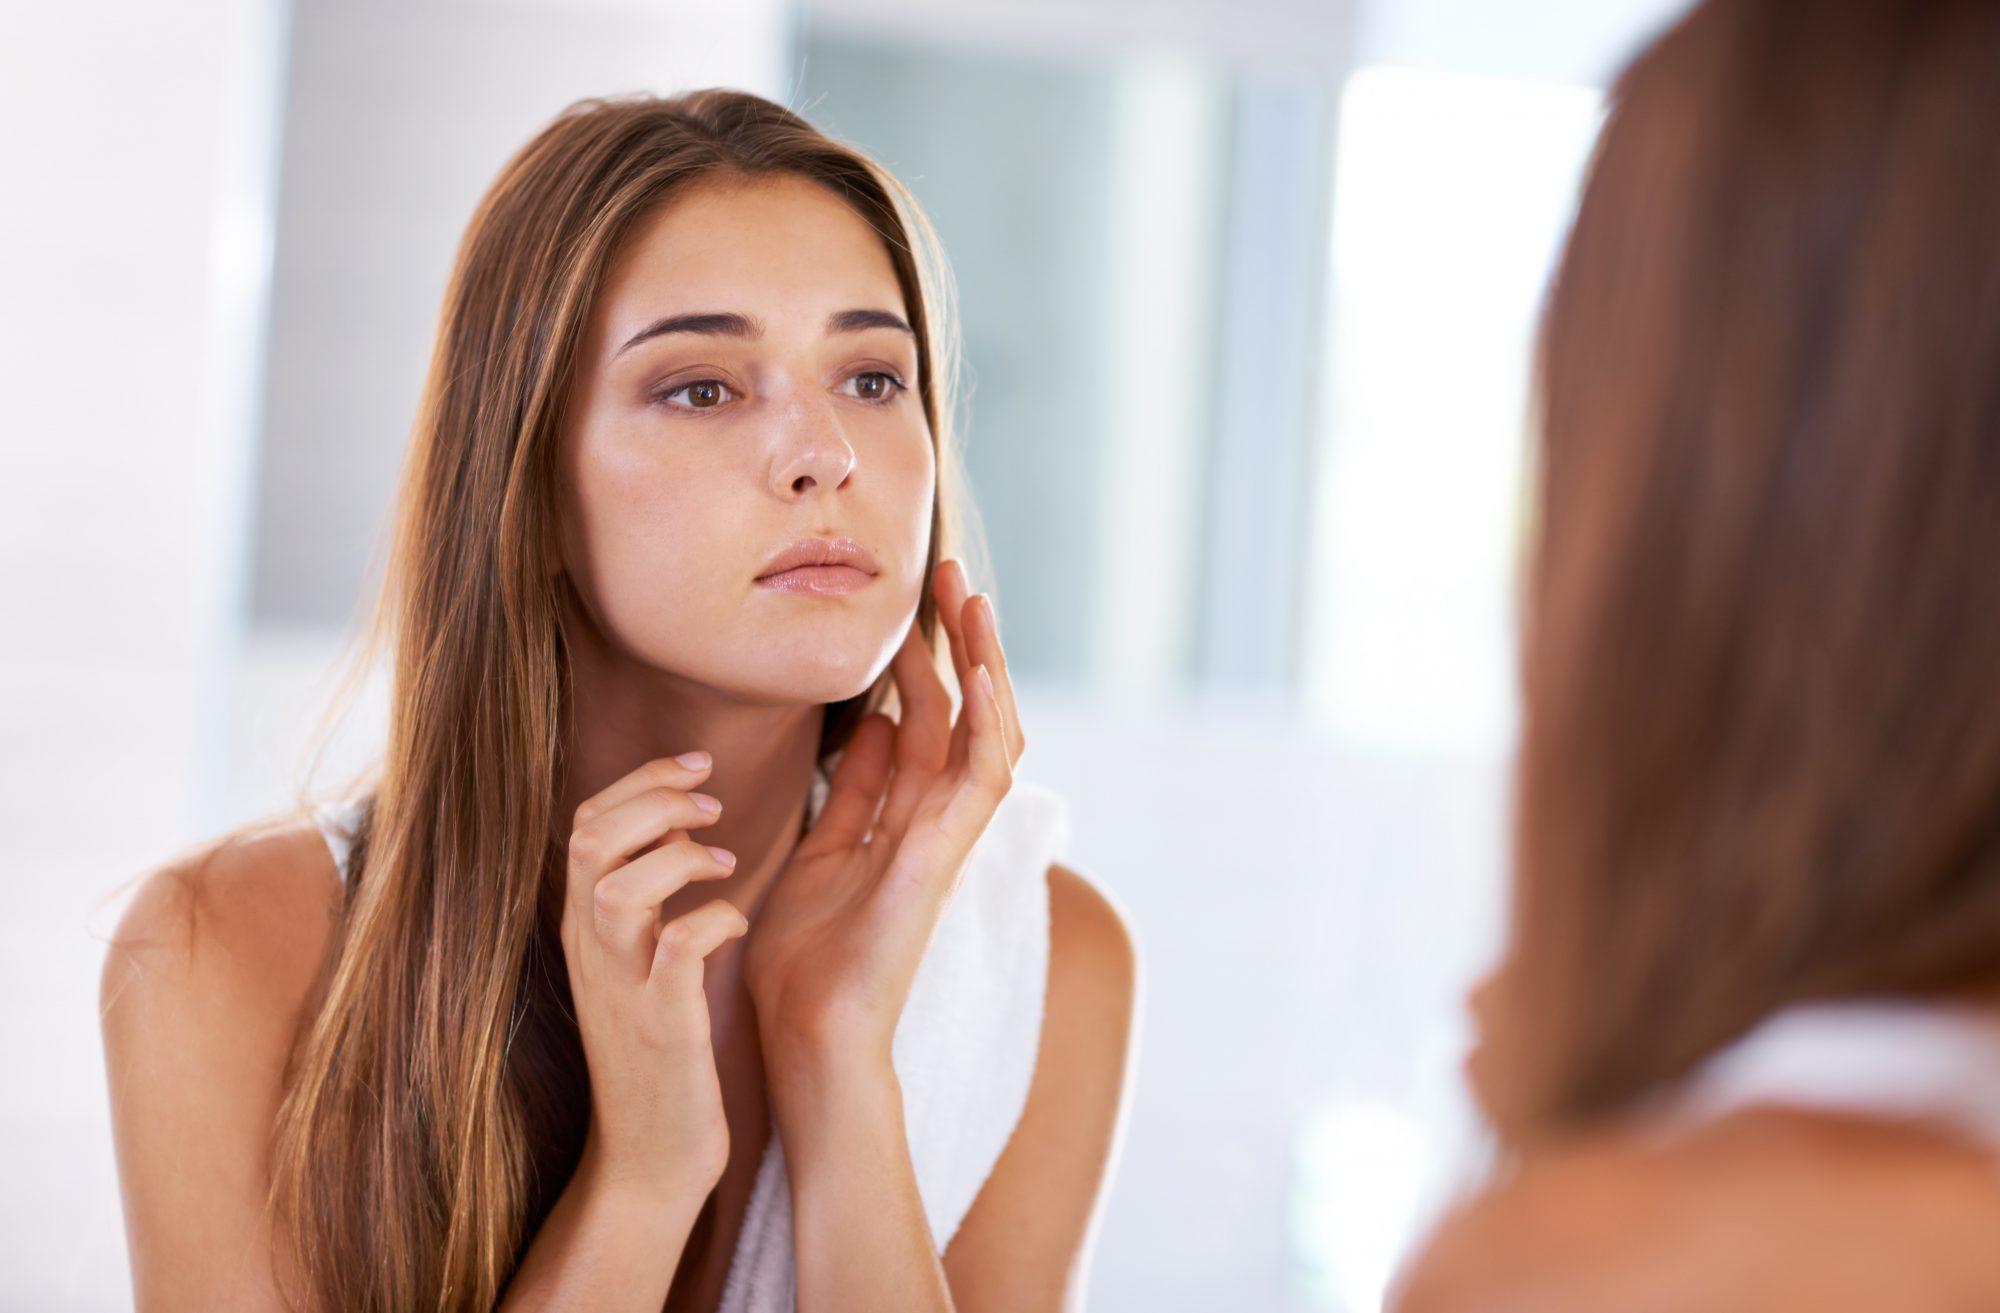 girl-looking-in-mirror-beauty-stock